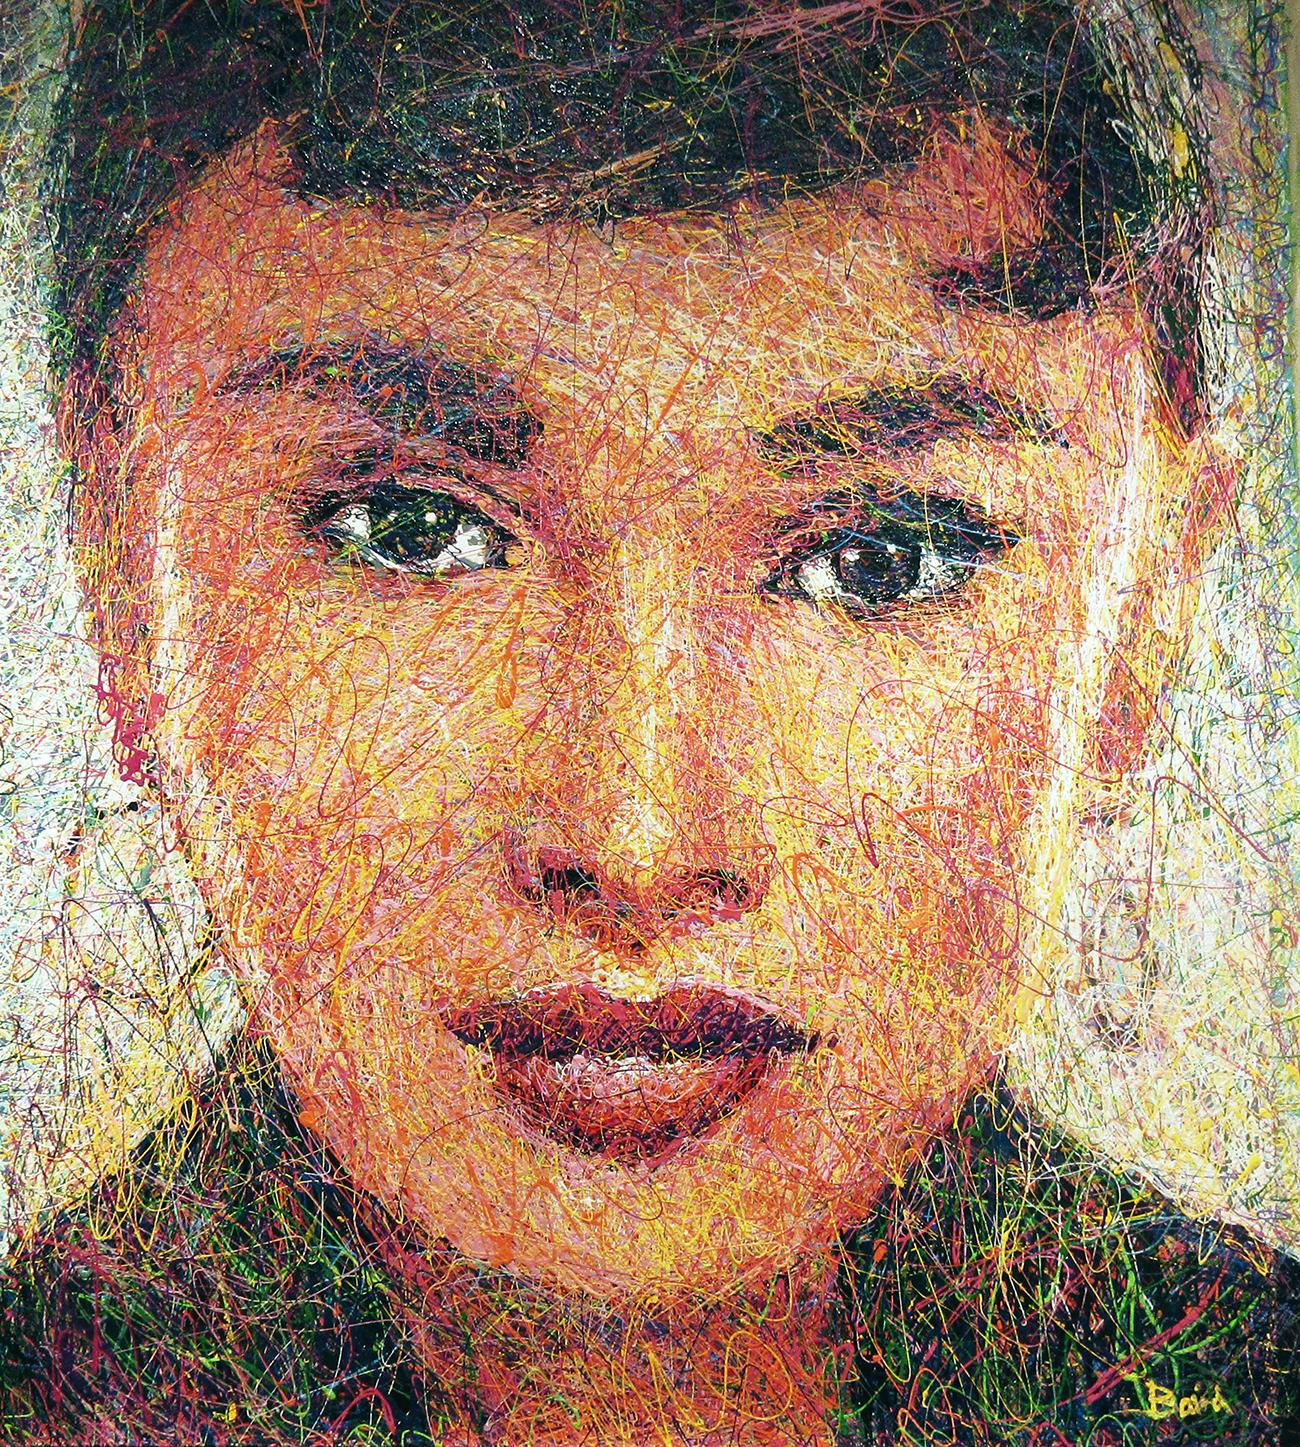 "Audrey 1/15/18 52"" x 45"" Acrylic on canvas"